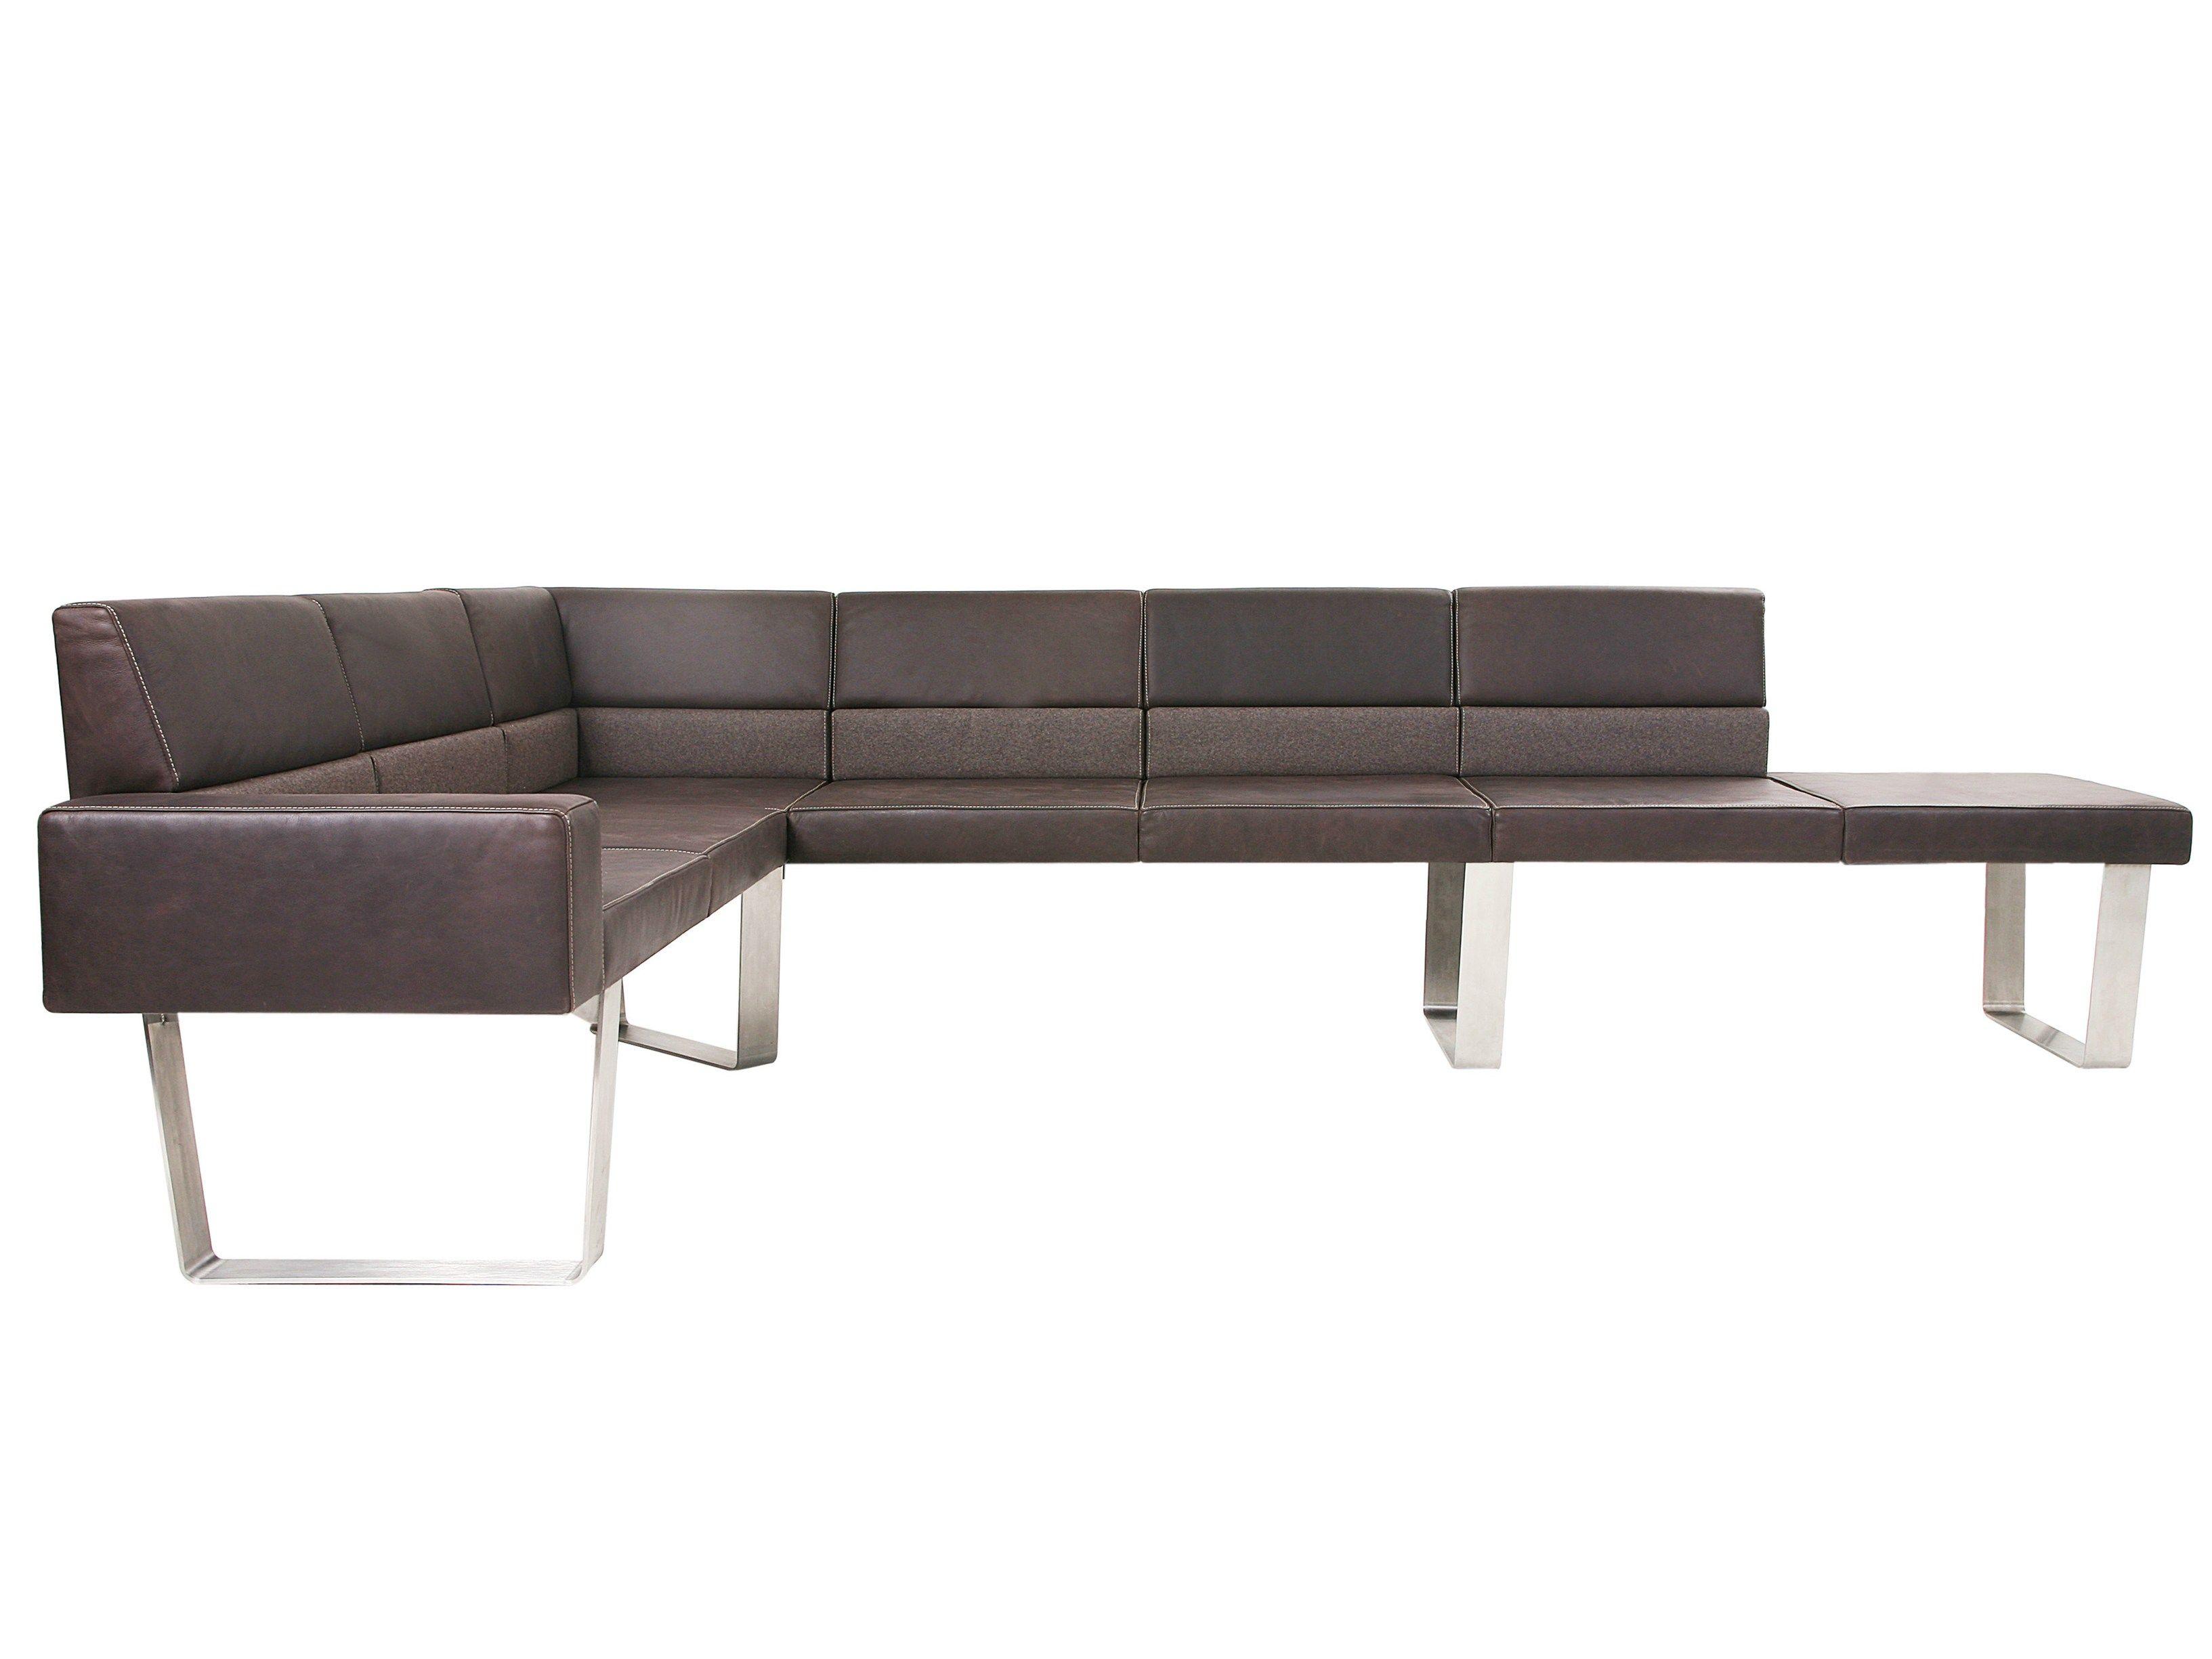 bench canap d 39 angle by kff design detlef fischer. Black Bedroom Furniture Sets. Home Design Ideas